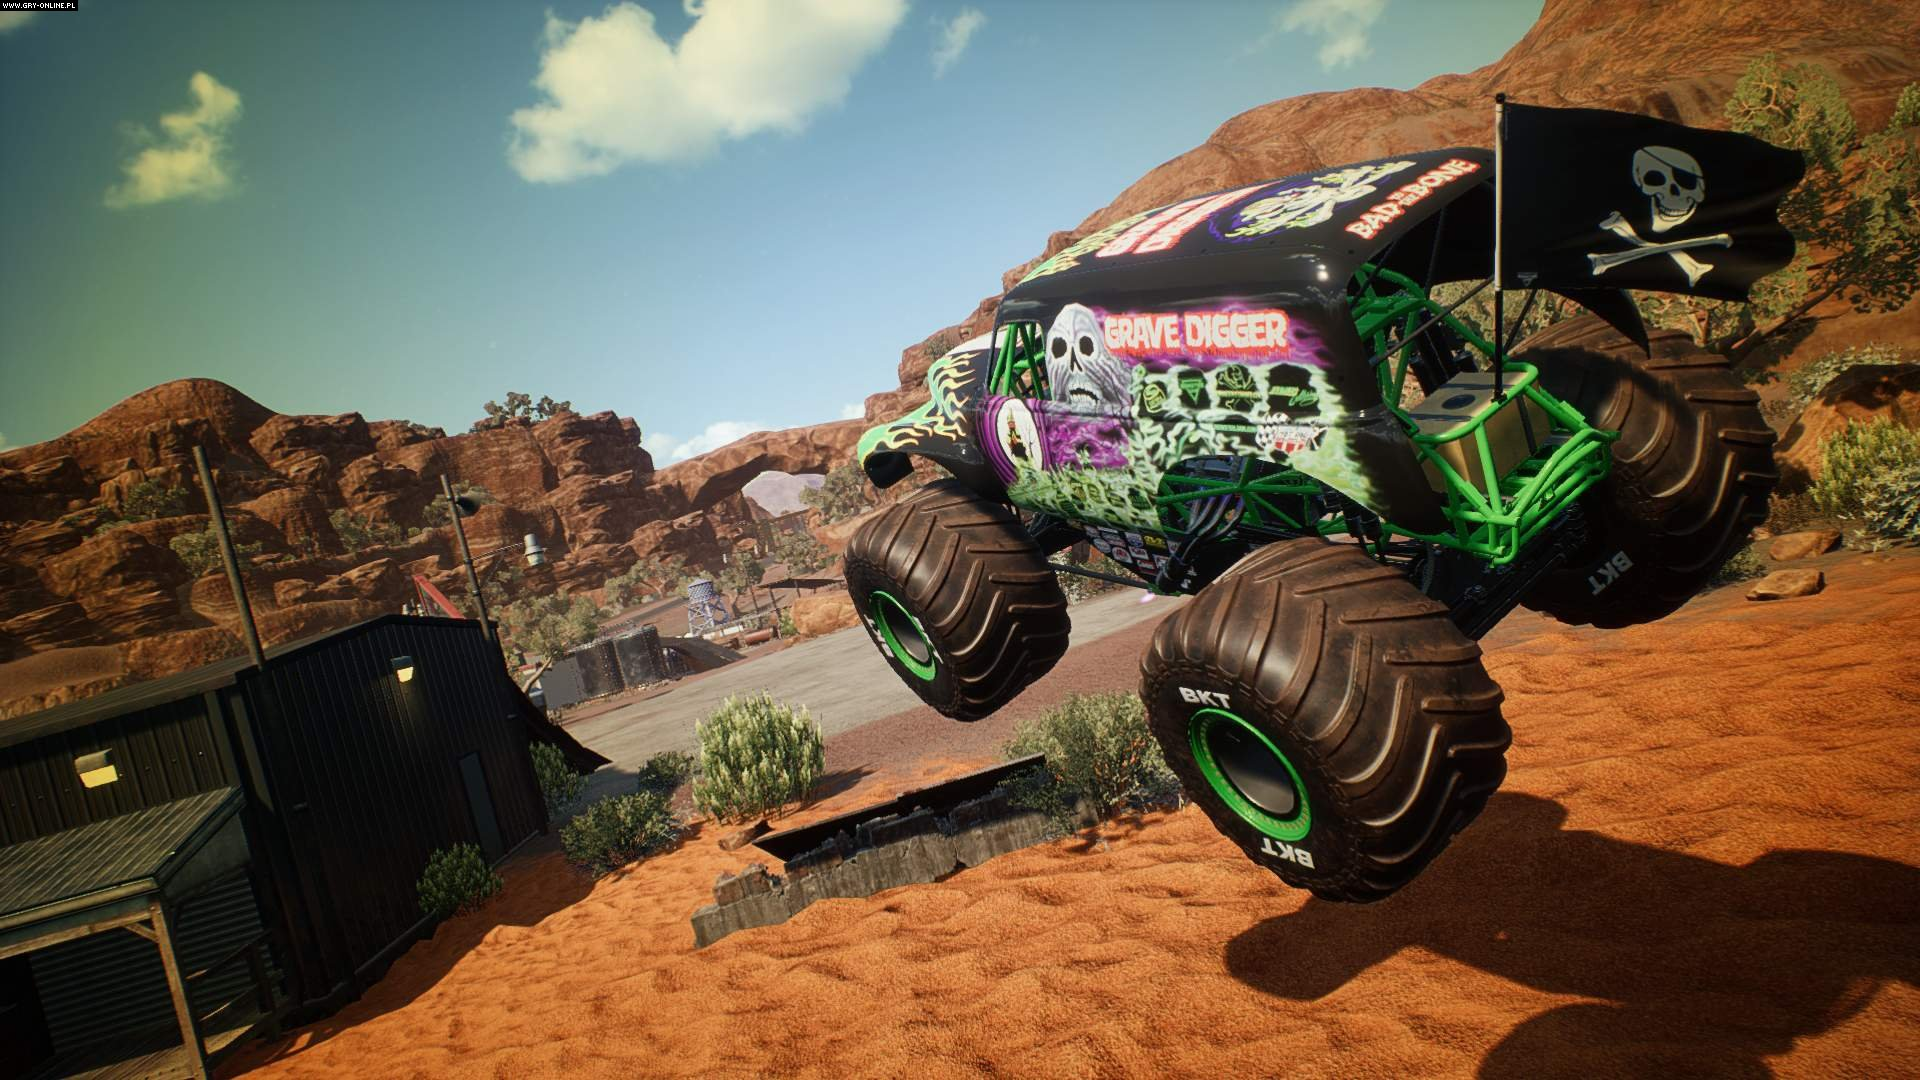 Monster Jam: Steel Titans PC, PS4, XONE Games Image 8/8, Rainbow Studios/THQ Digital Phoenix, THQ Nordic / Nordic Games